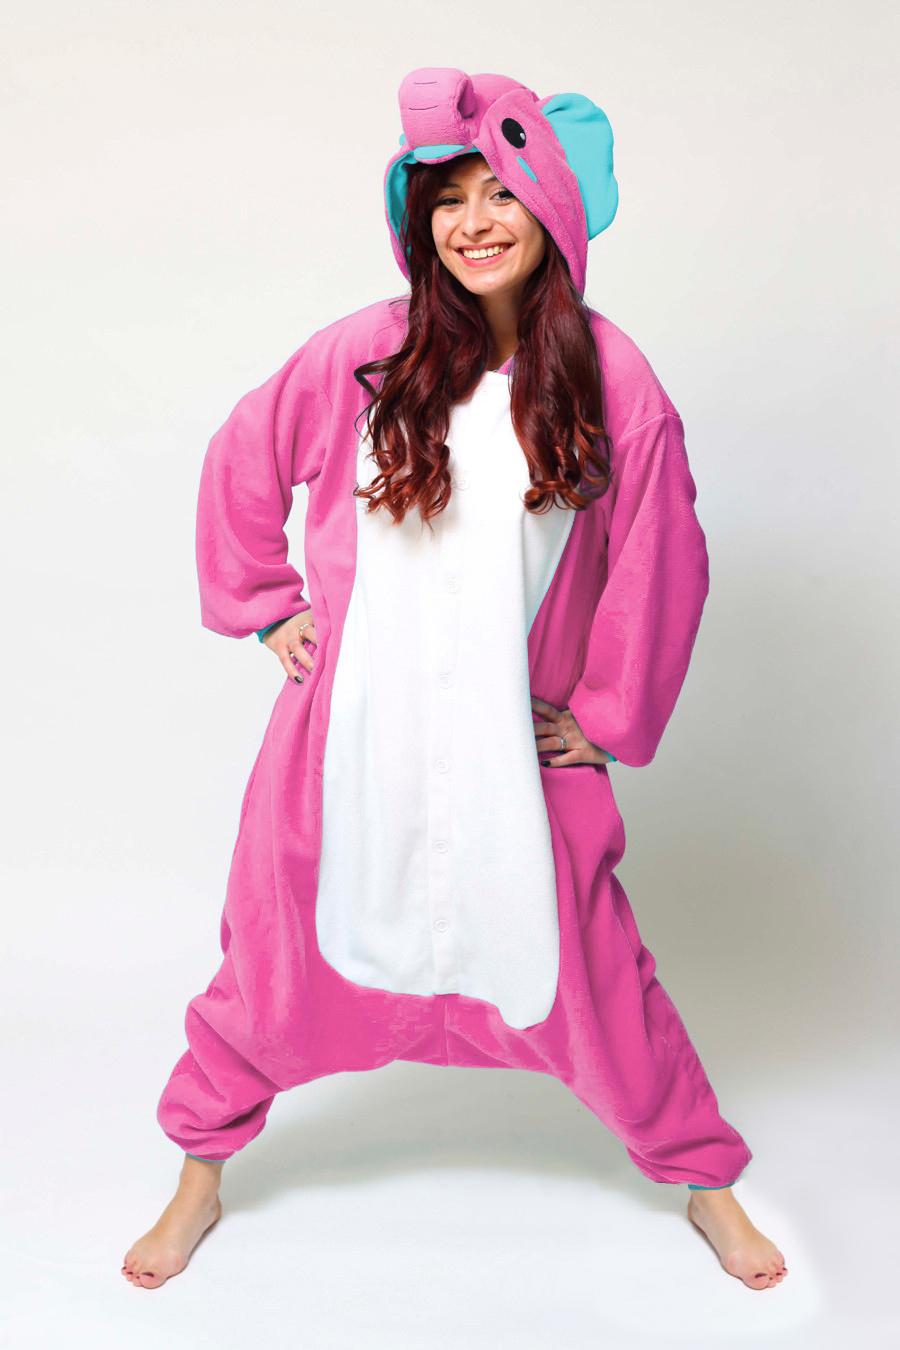 384aefa78 Buy your Pink Elephant onesie now! - PartyinyourAnimal.com